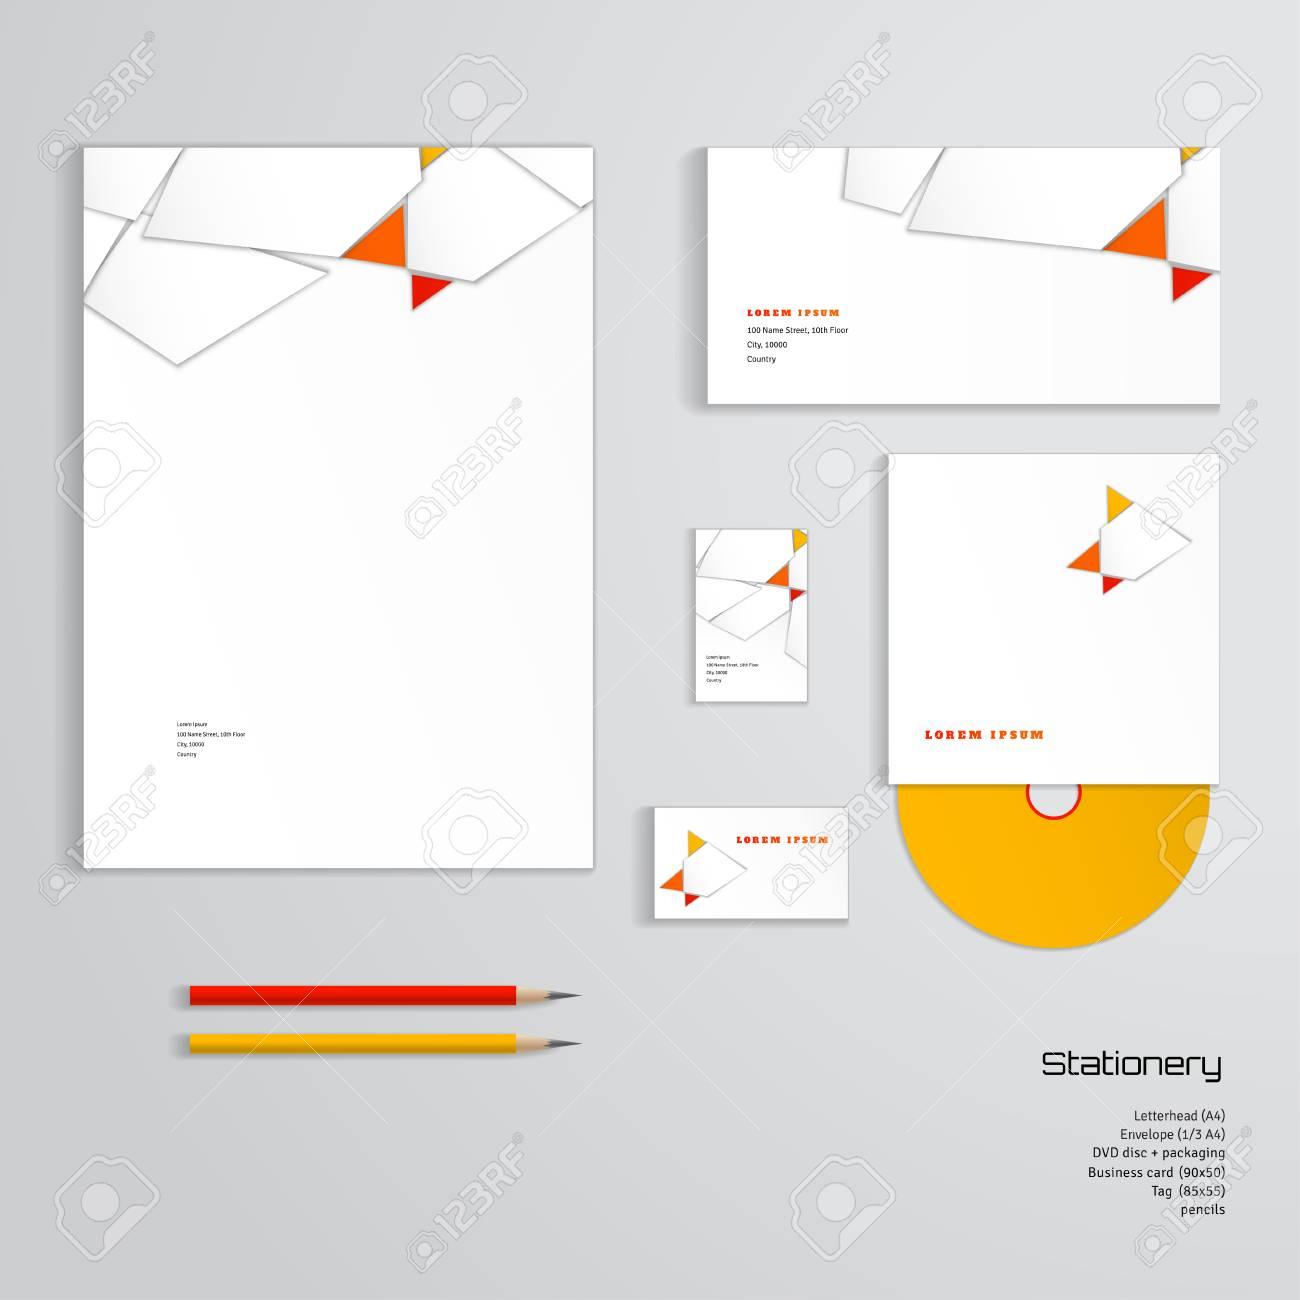 Vector identity templates letterhead envelope business card vector identity templates letterhead envelope business card tag disc with packaging colourmoves